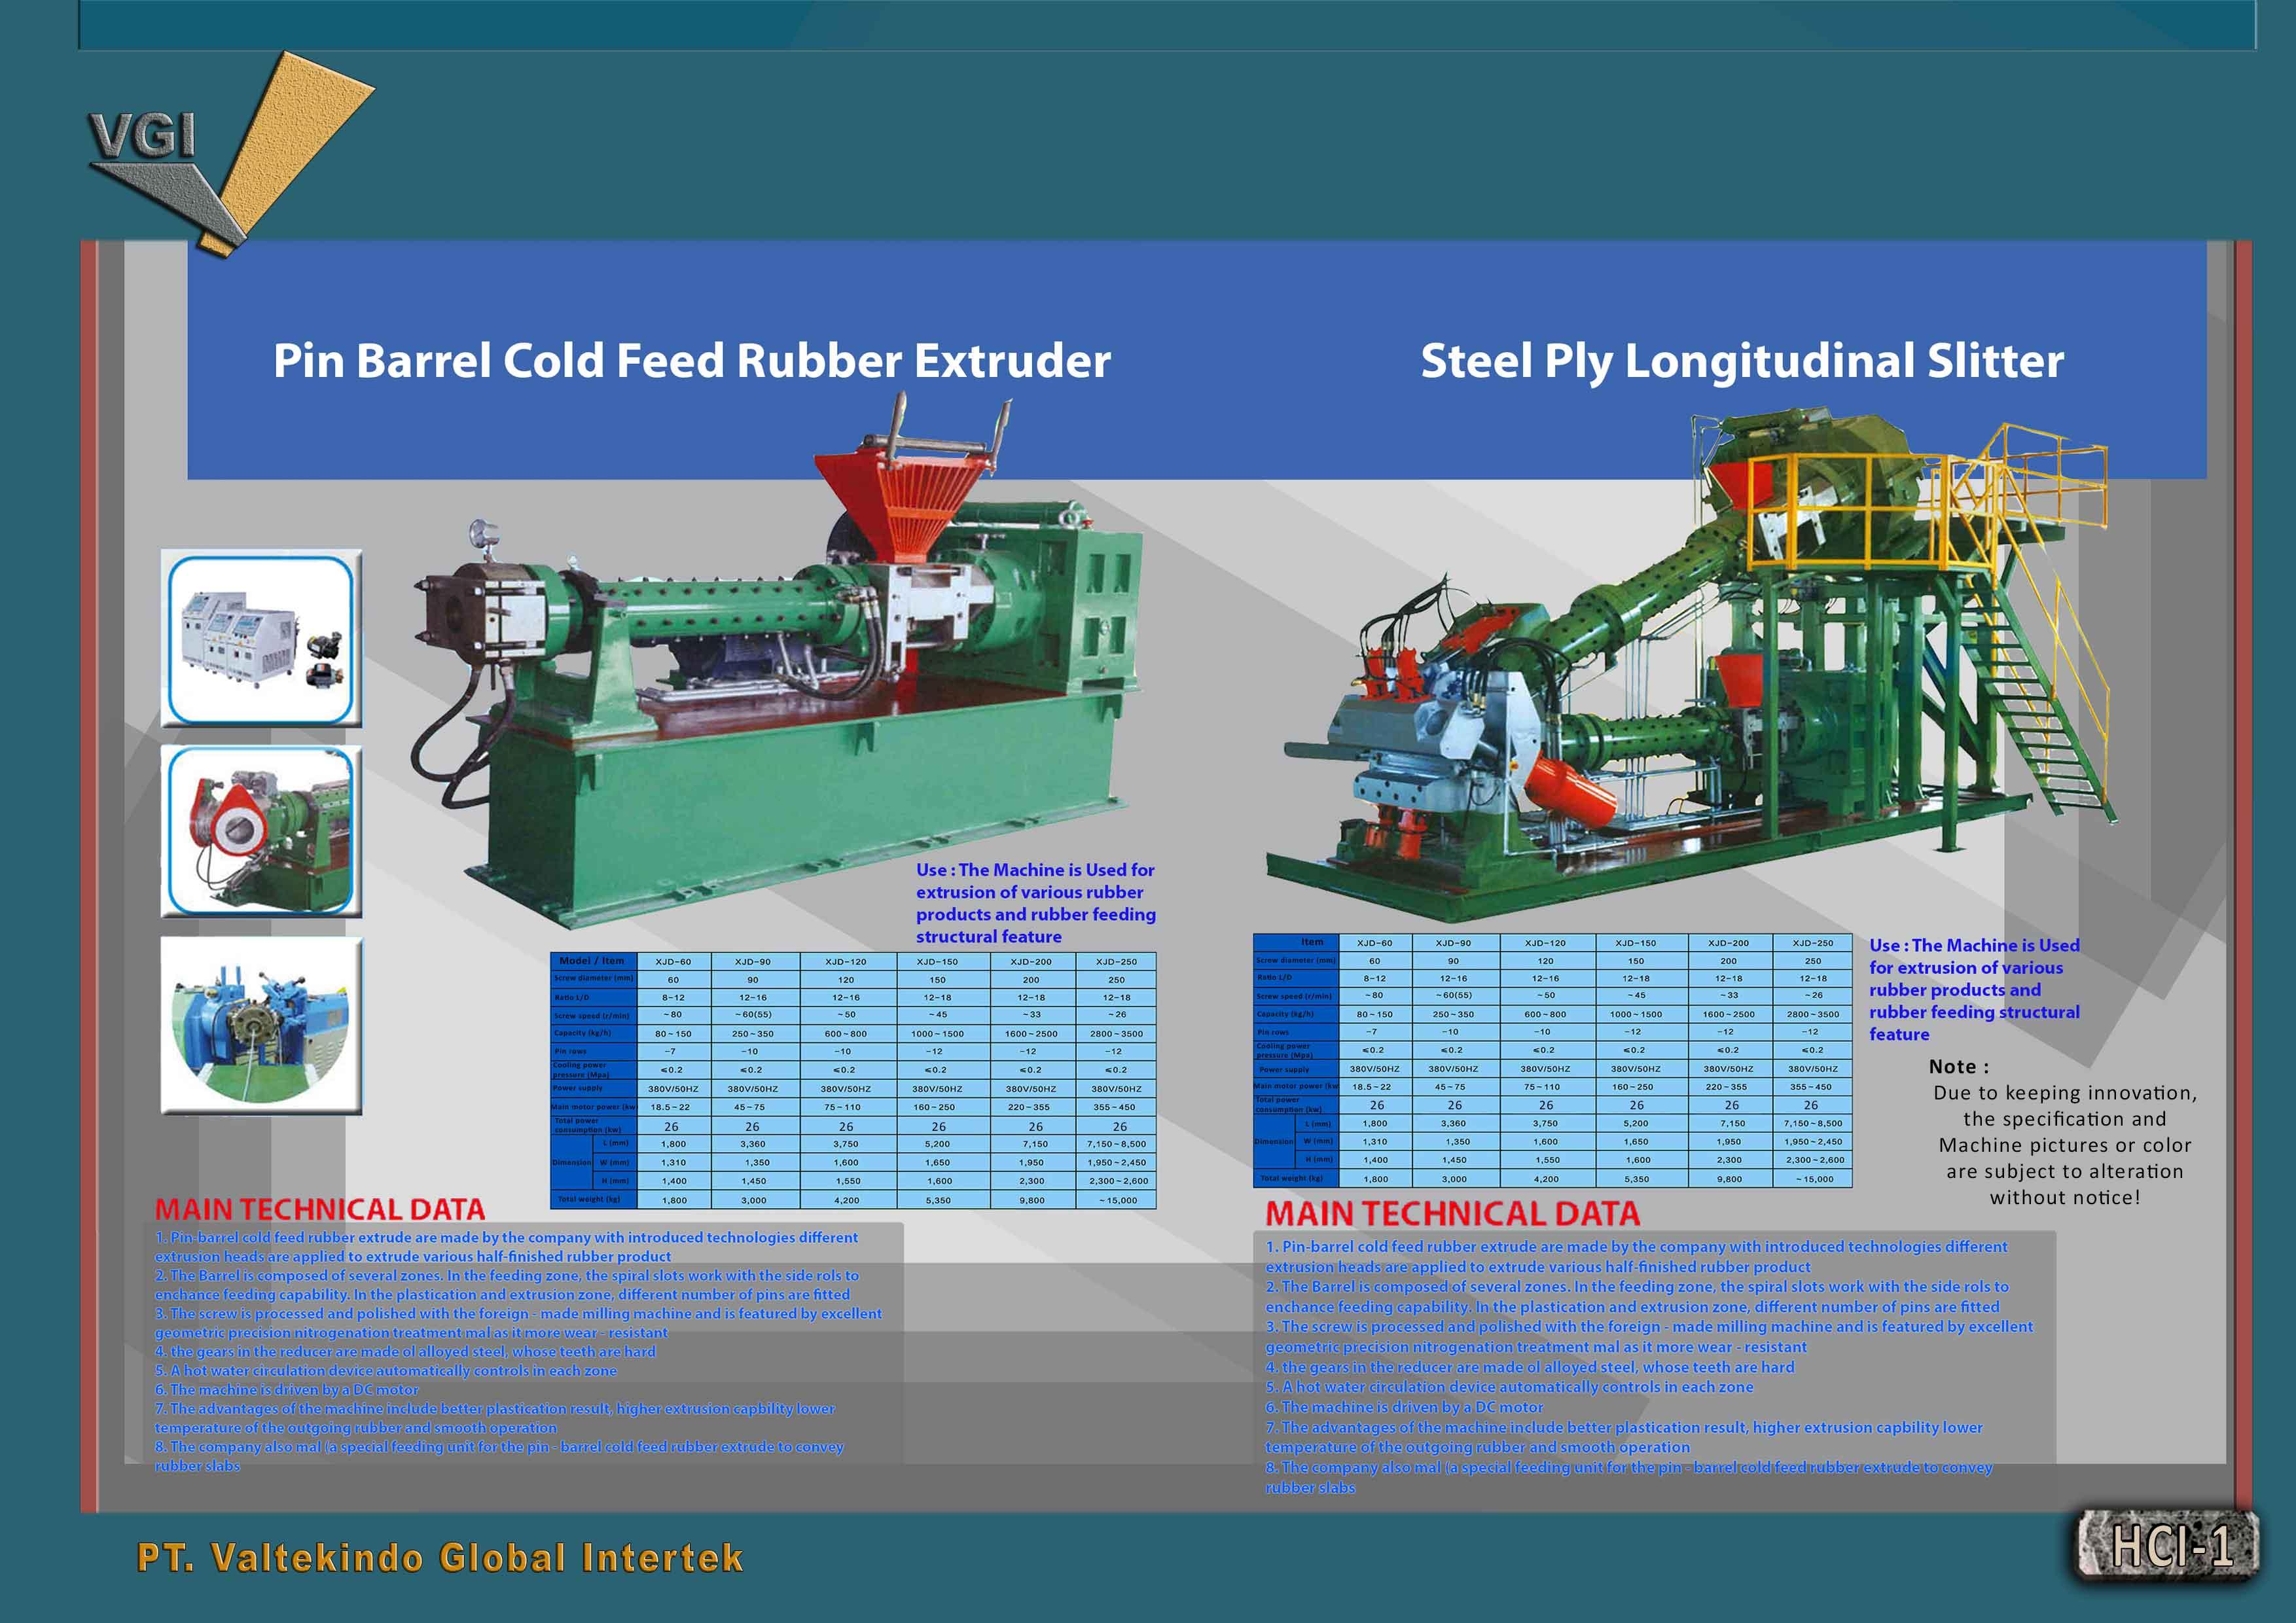 jual mesin, harga mesin, jual mesin bandung, distributor mesin, jual mesin karet, daur ulang karet, daur ulang plastik, mesin pertanian Pin Barrel Extruder Steel Ply Longitudinal Slitter Pin Barrel Extruder Steel Ply Longitudinal Slitter